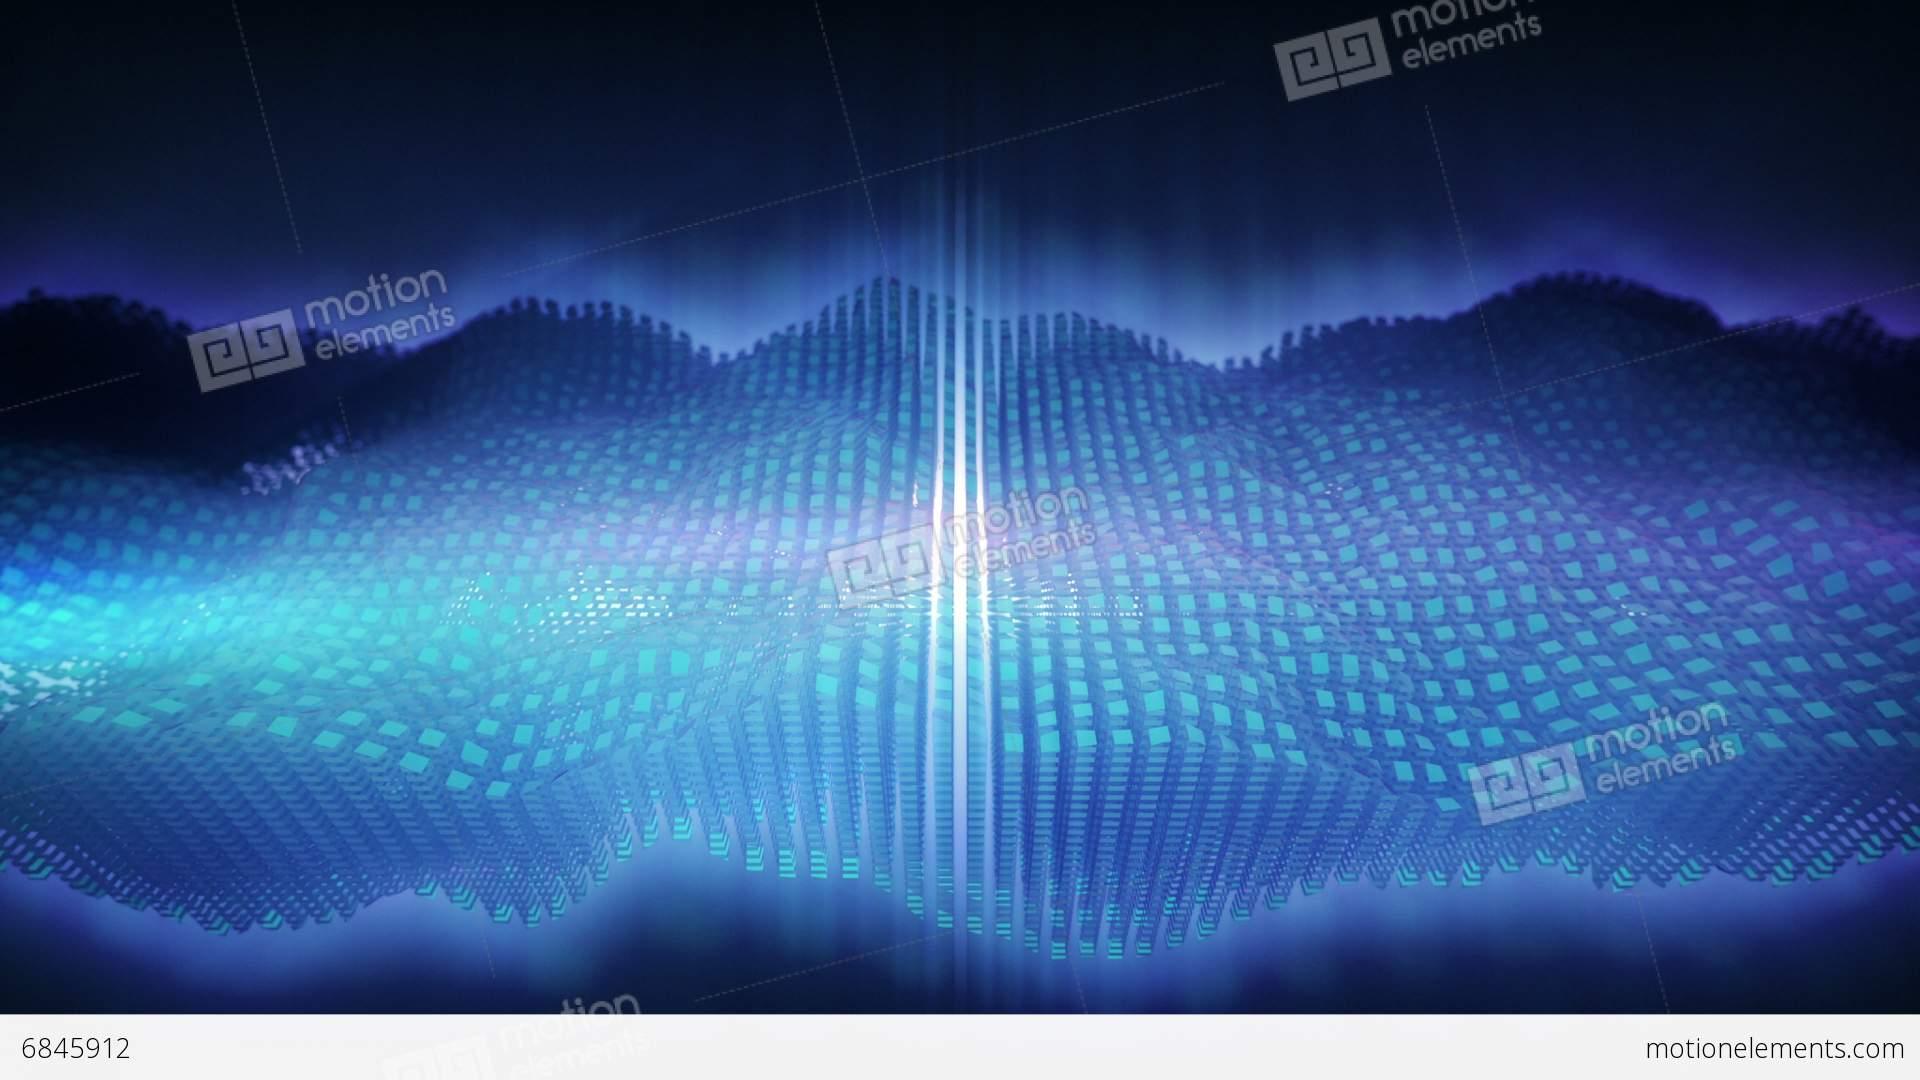 3d Audio Waves Loop Stock Footage Video | Getty Images  |3d Audio Waveform